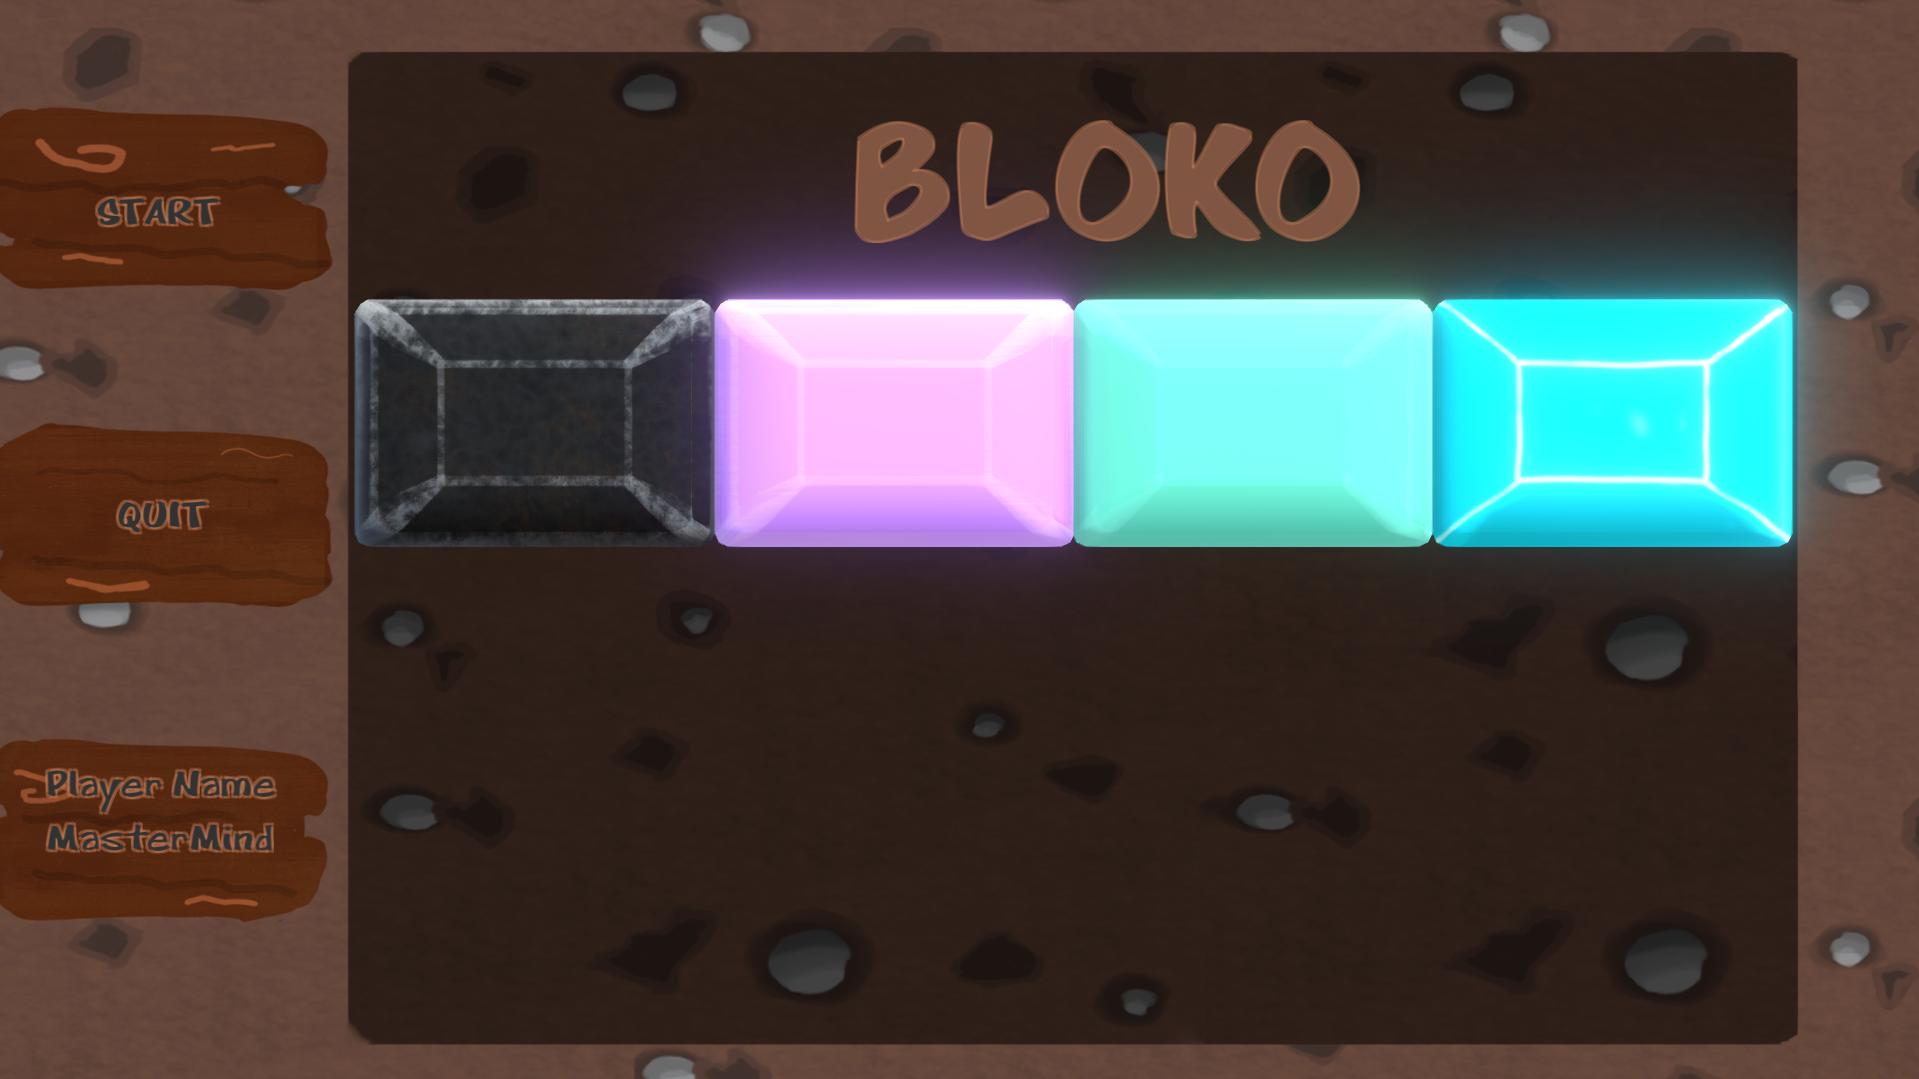 BLOKO